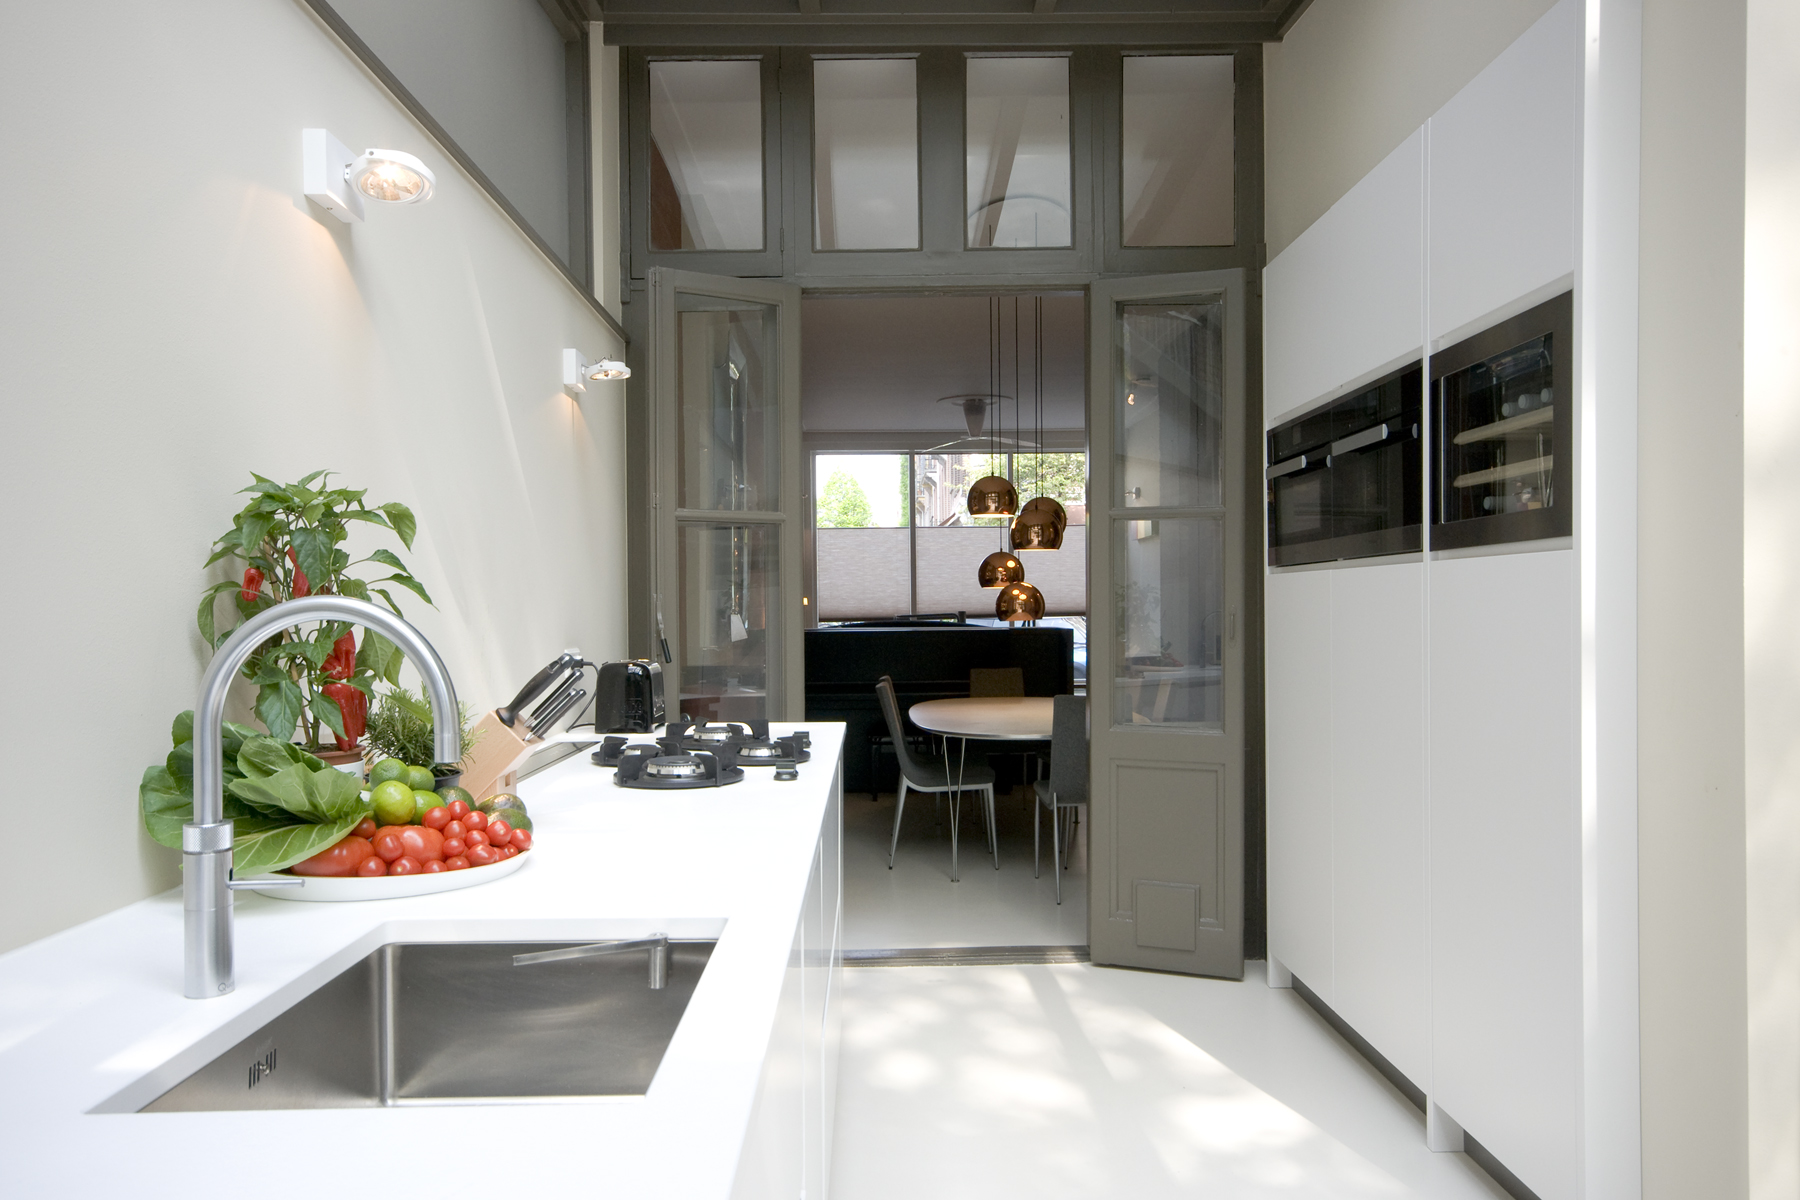 rietveld interieurbouw amsterdam keuken 28